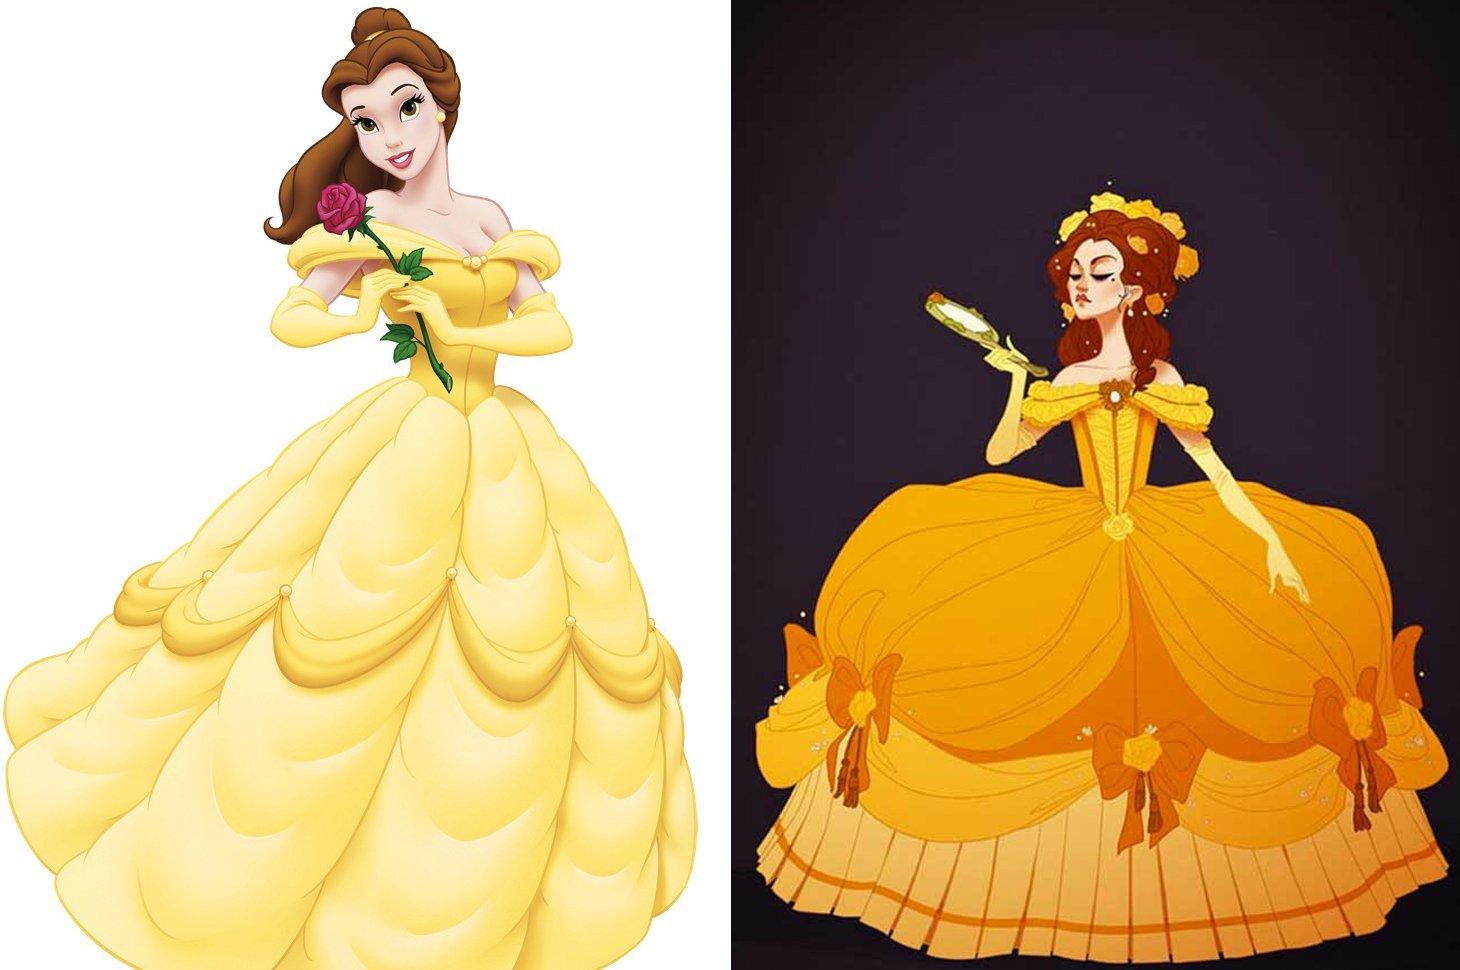 Princesas de disney vestidas seg n la poca de su historia - Casas de princesas ...